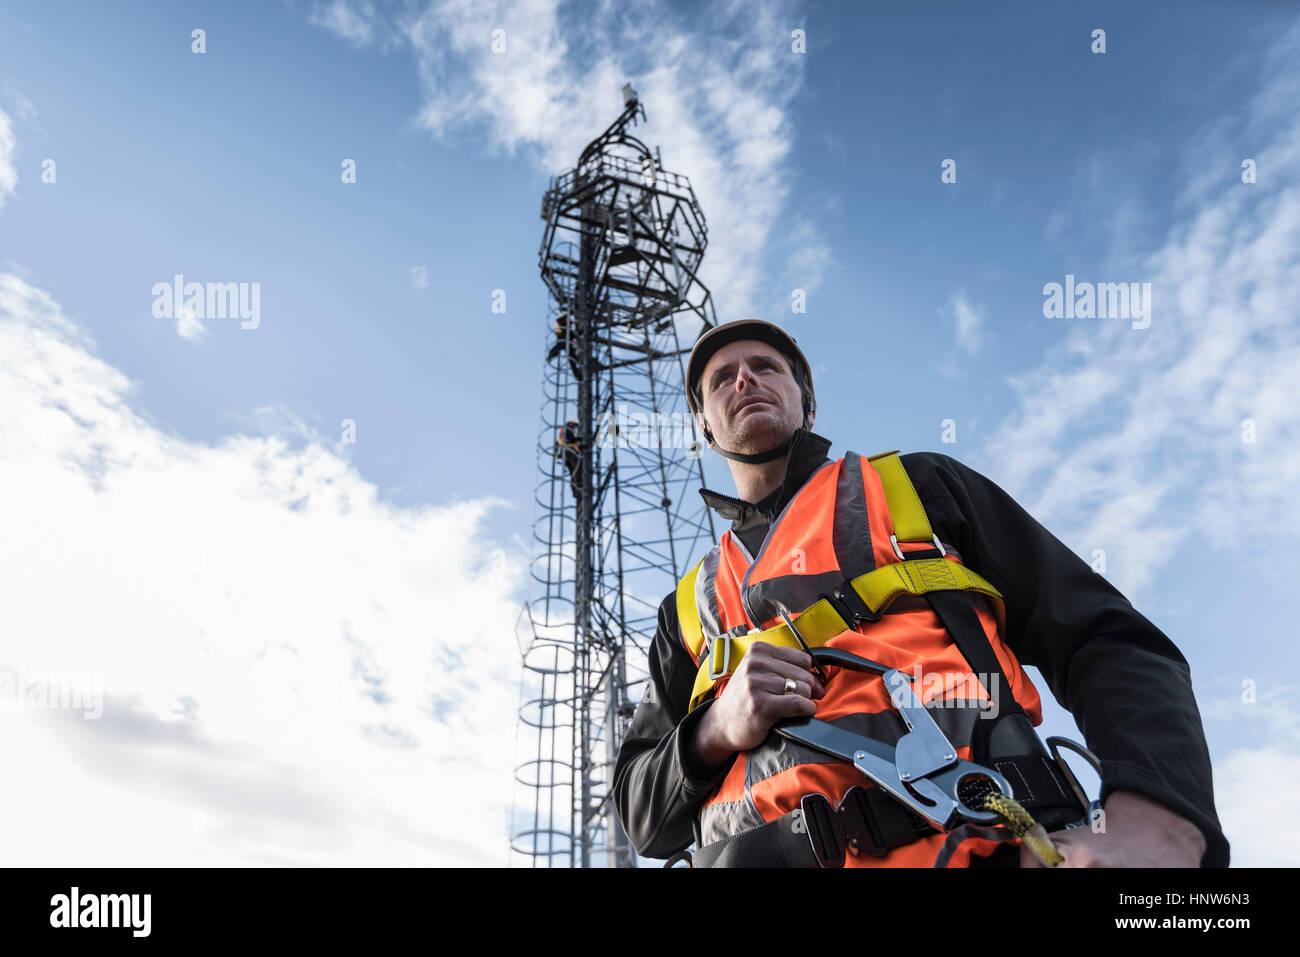 Getriebe-Turm-Ingenieur mit Tower, niedrigen Winkel Blick Stockbild